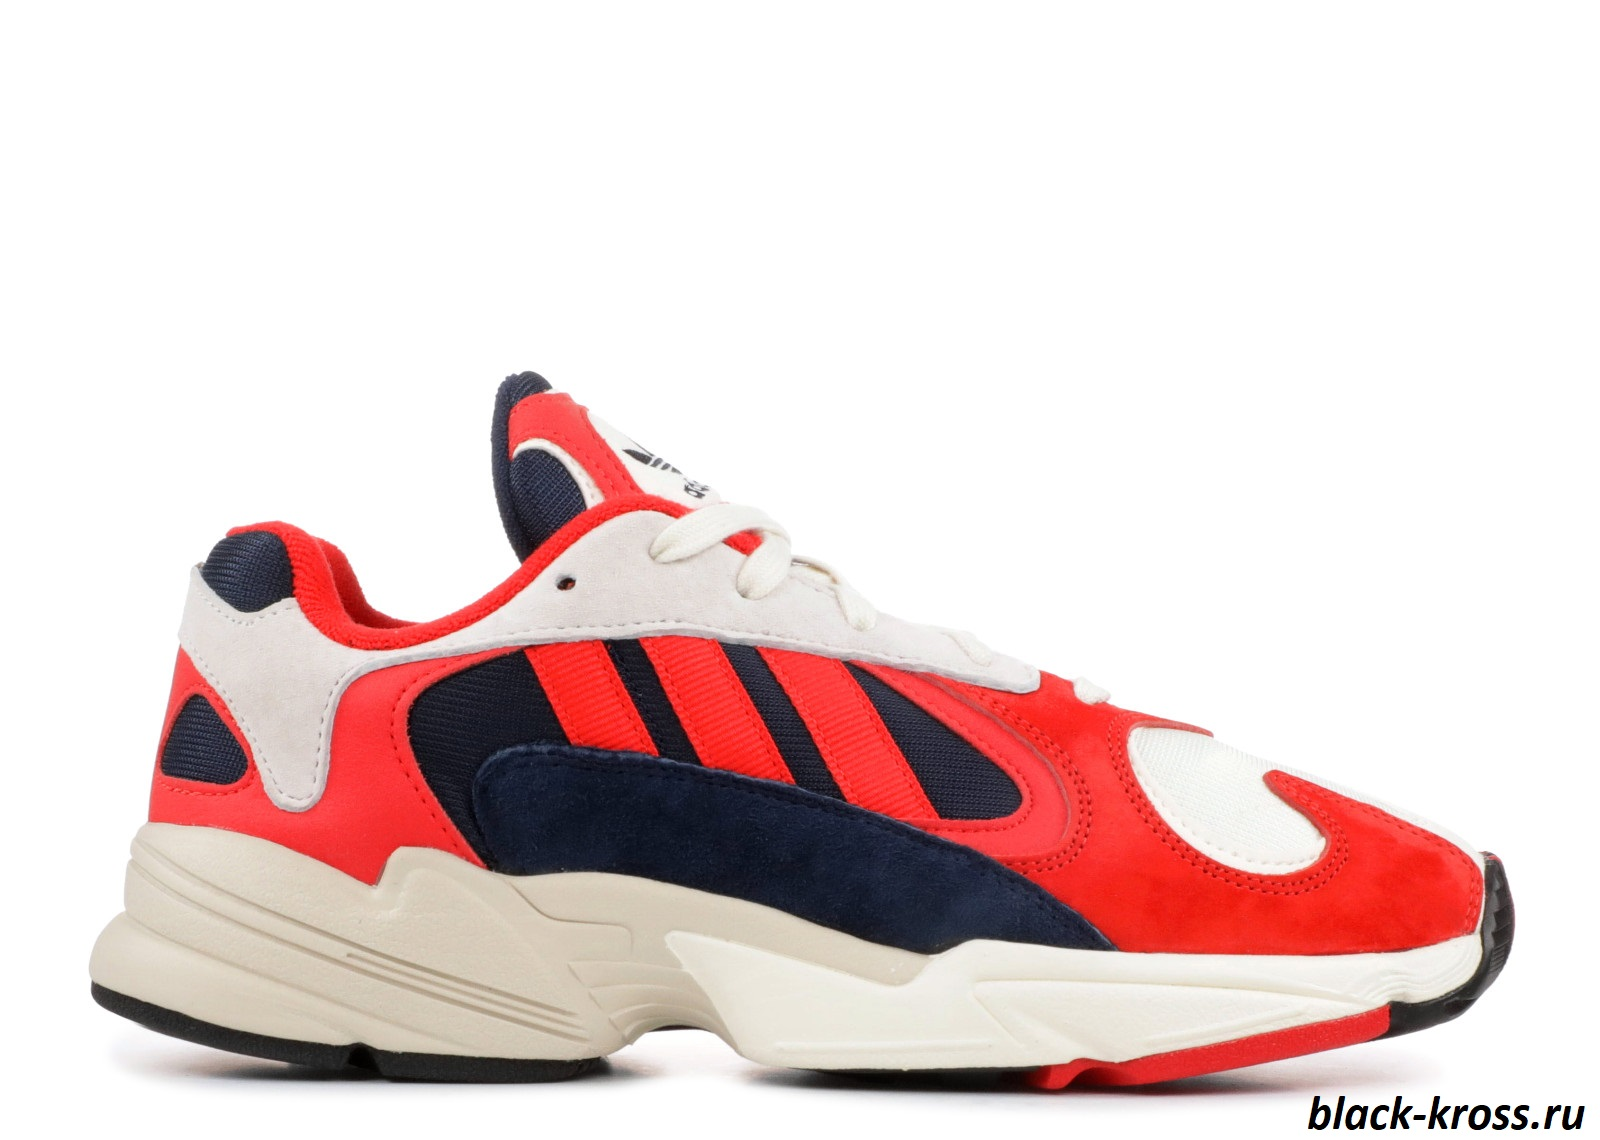 Adidas Yung-1 Red (36-45)